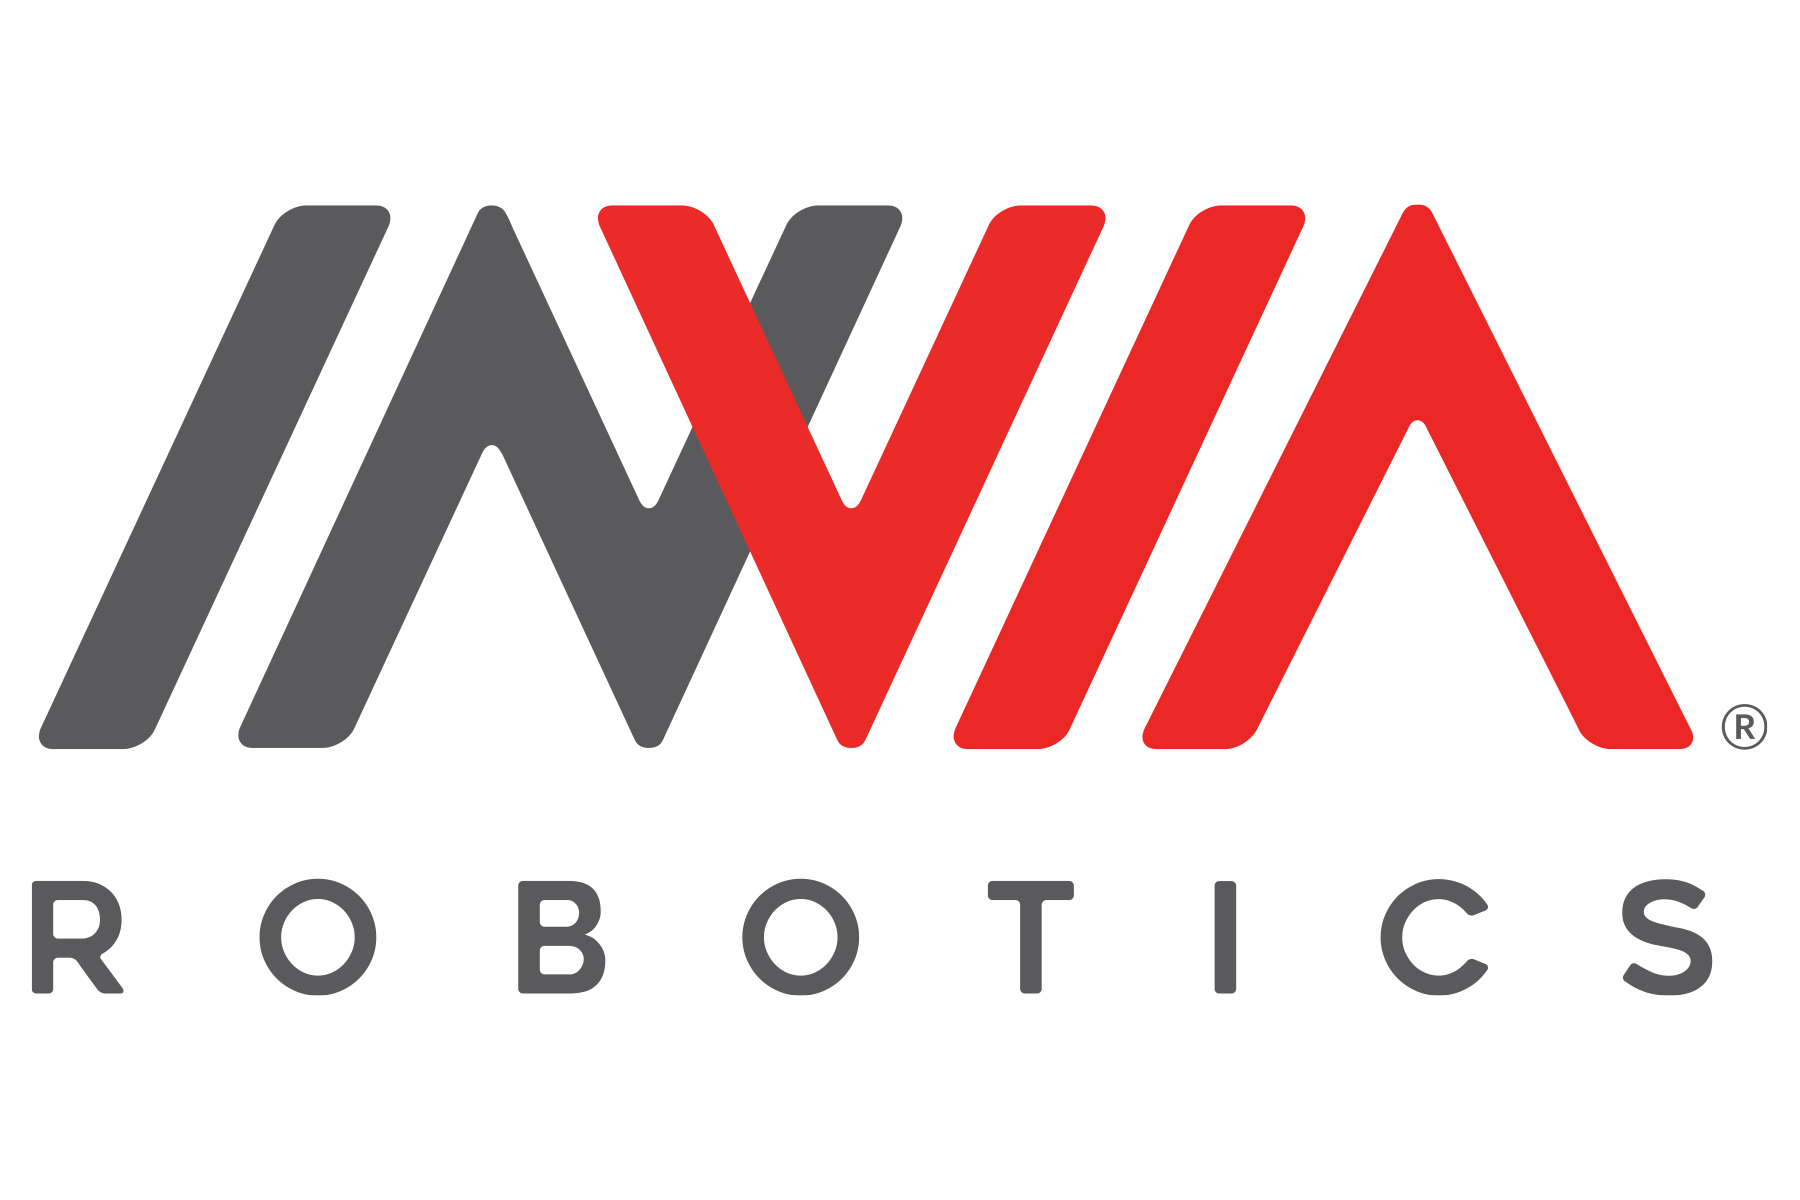 inVia Robotics Raises $20 Million Series B Funding for Warehouse Automation Robots